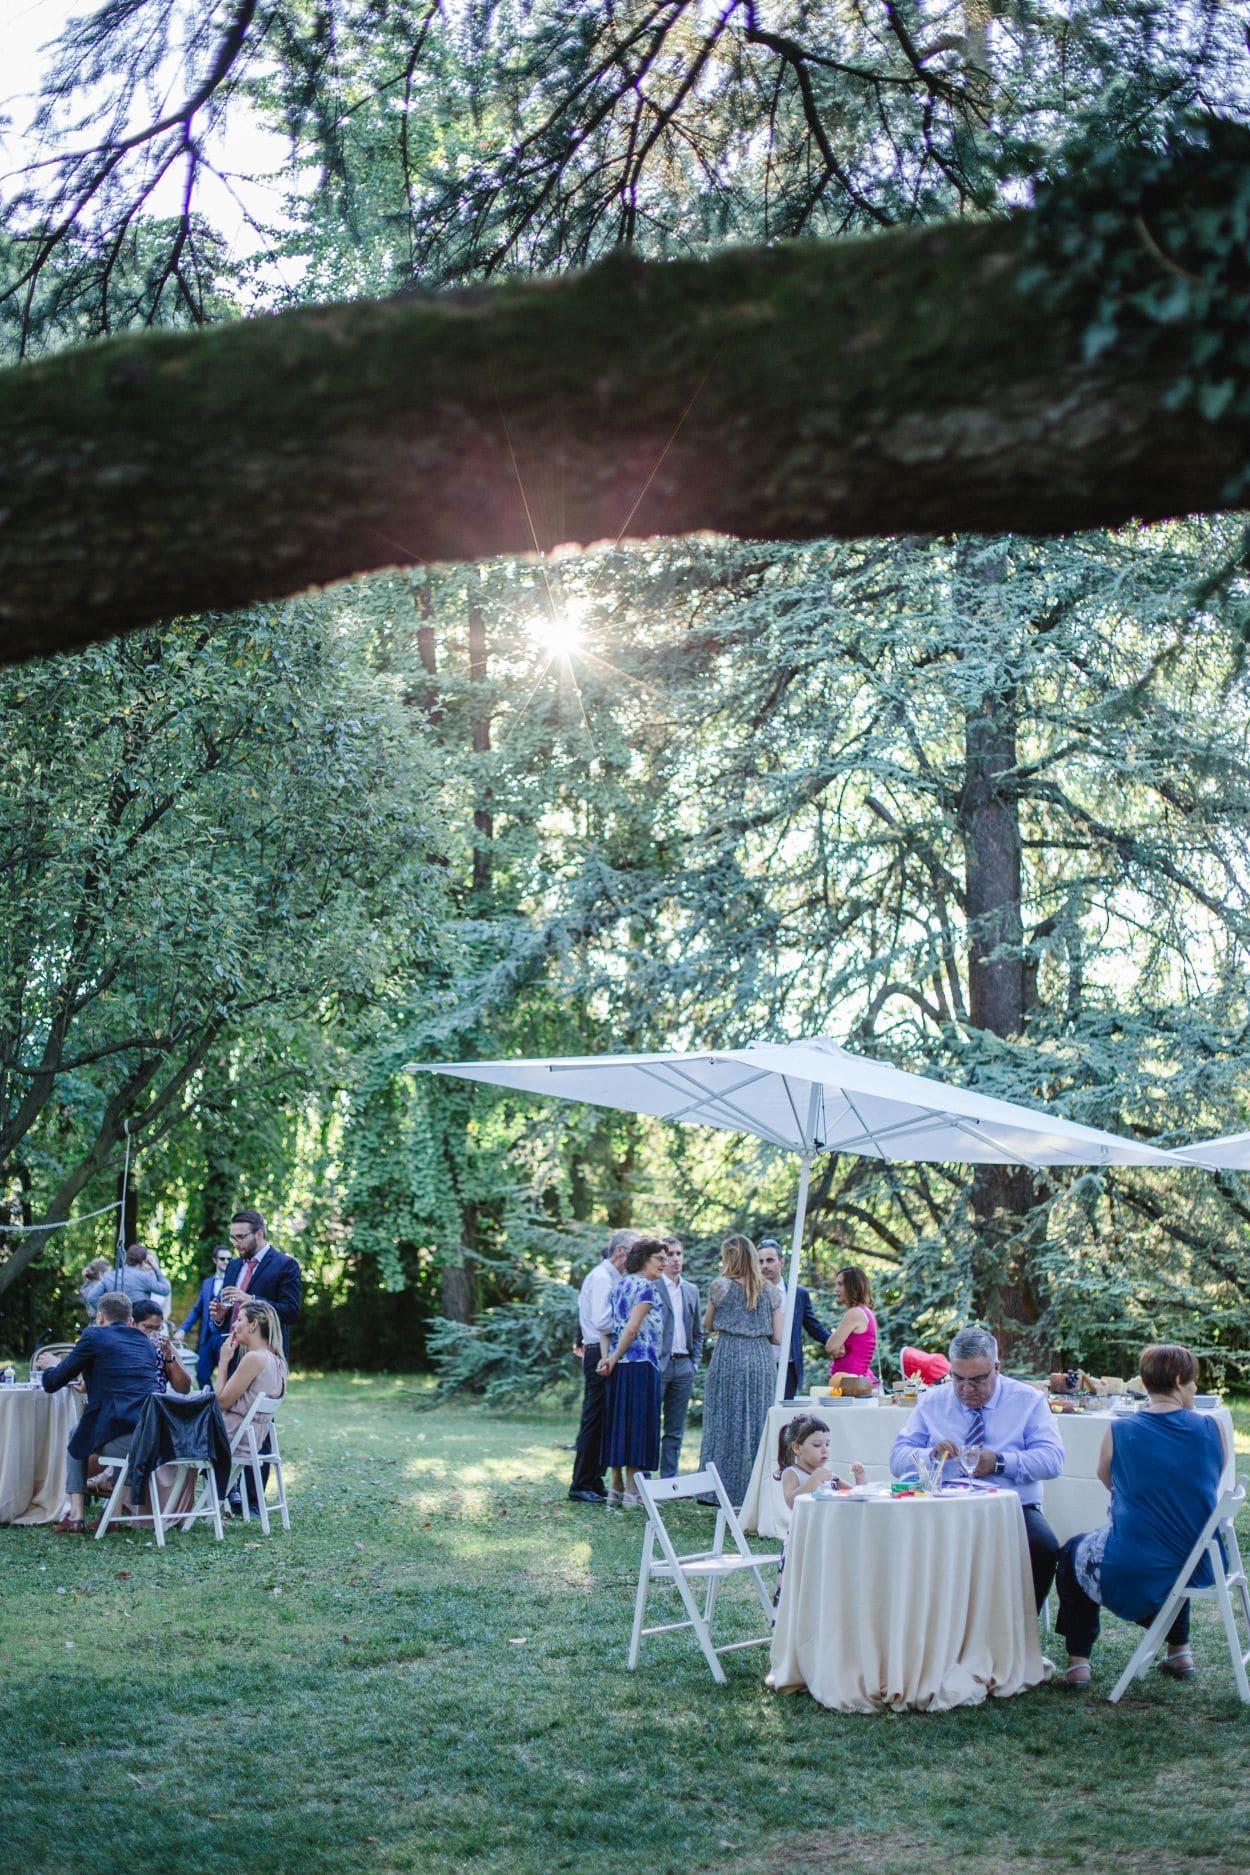 Million Memories_A&D_Hochzeitsfotograf_Schlosshochzeit_Toskana_Lago Di Como_Wedding_Tuscany_152